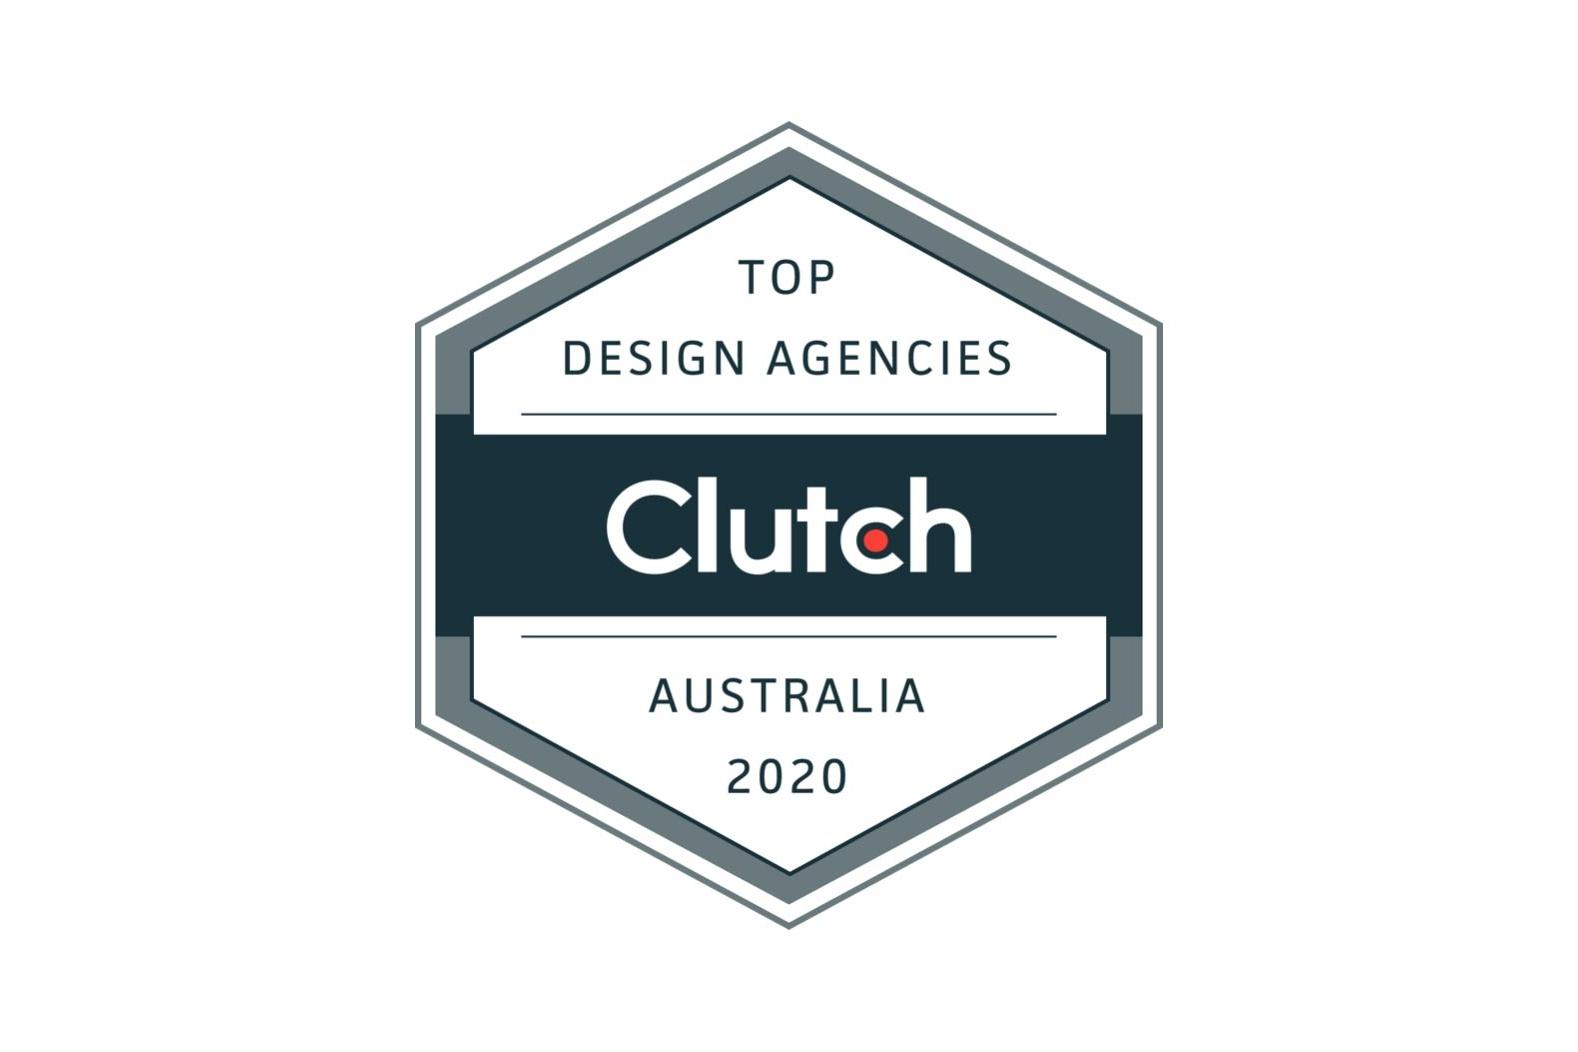 Clutch Top Design Agencies Australia 2020